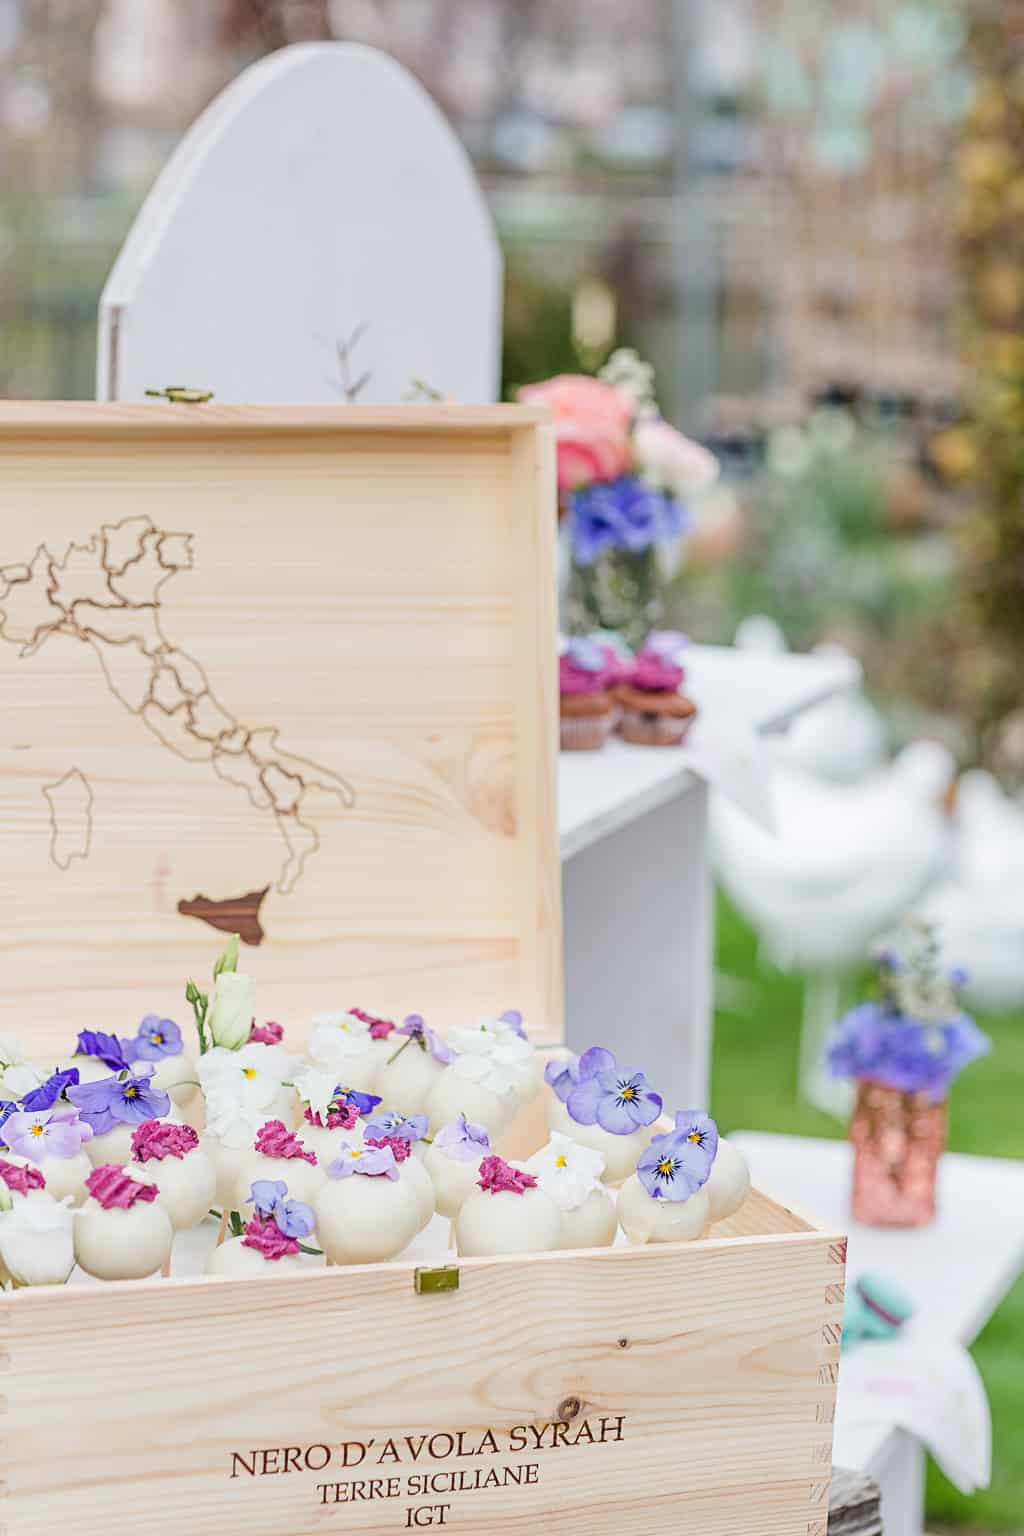 160402-Bridal-Tea-Time-011-Cake-Pops